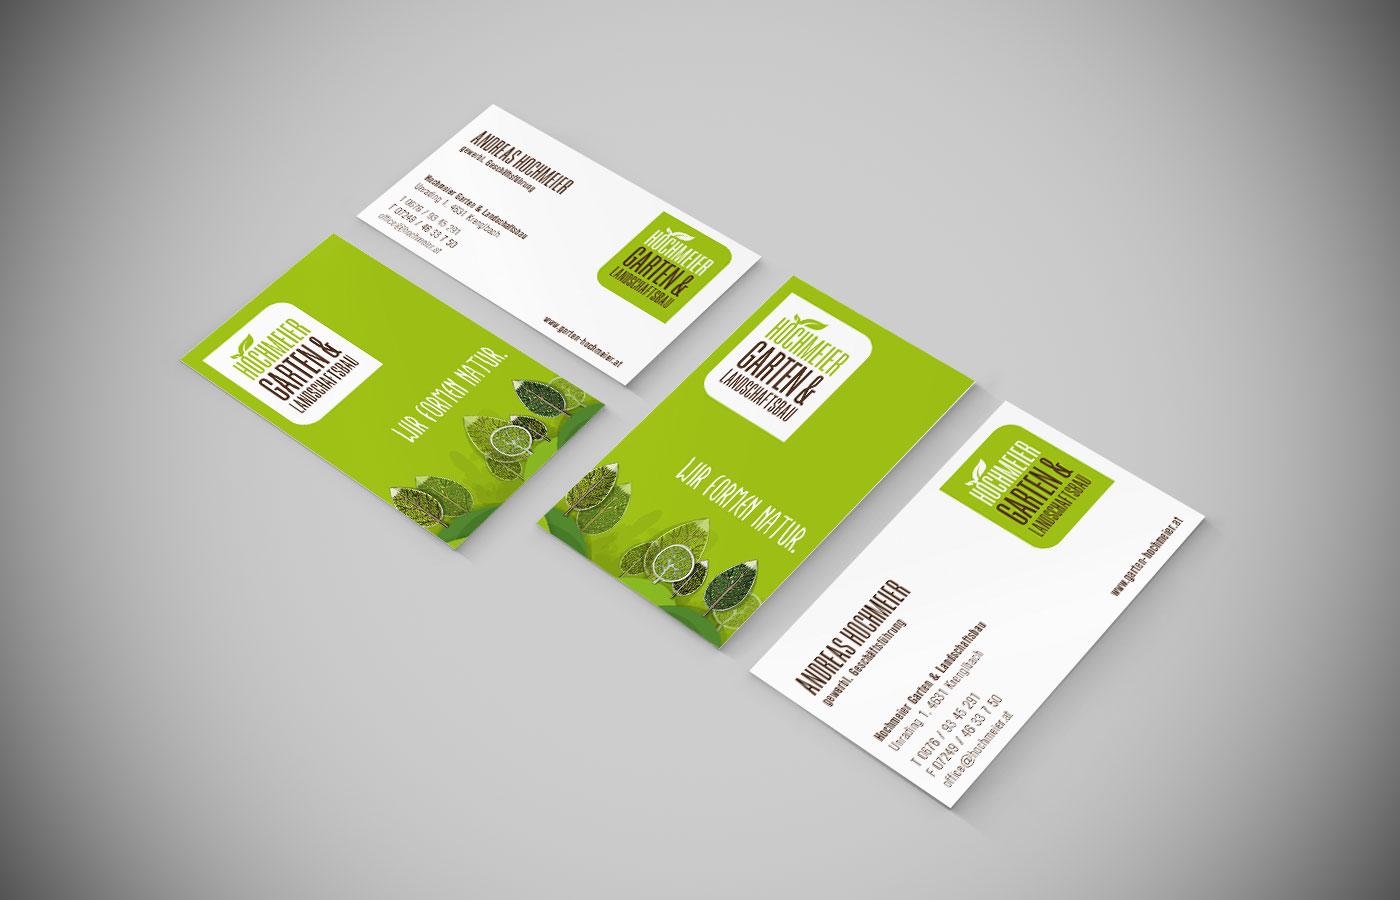 Hochmeier_Visitenkarten_MockUp